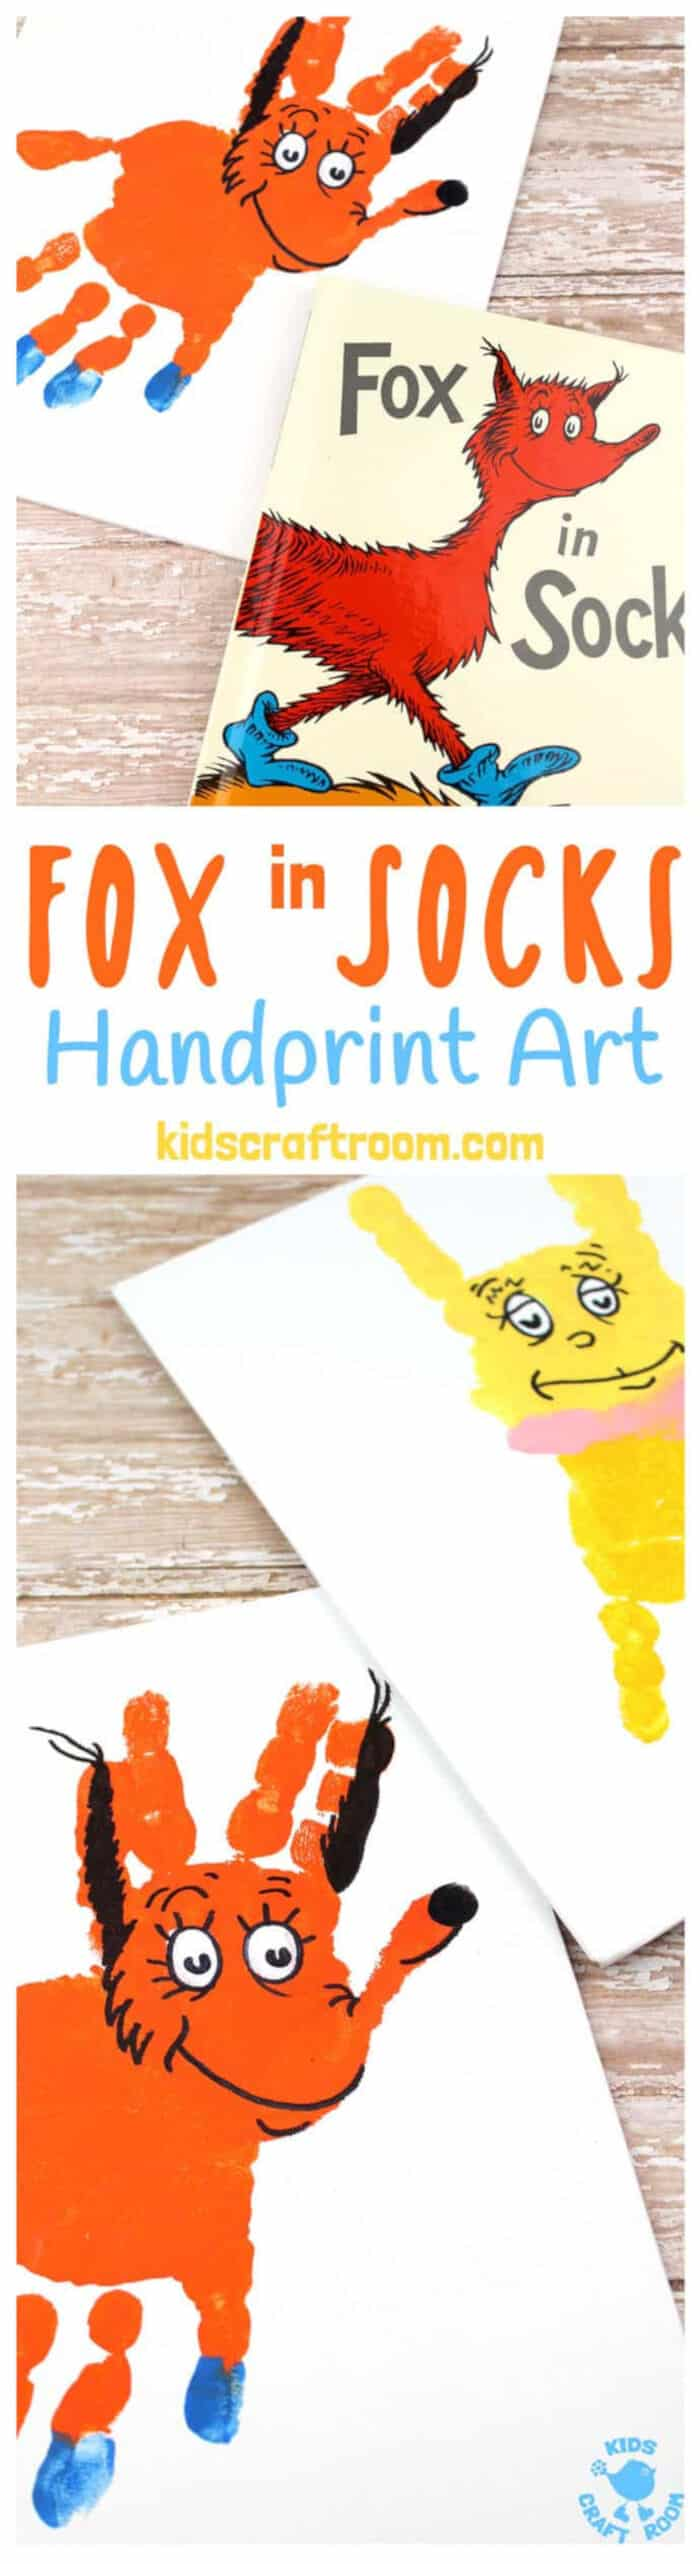 Fabulous Fox In Socks Handprint Craft by Kids Craft Room